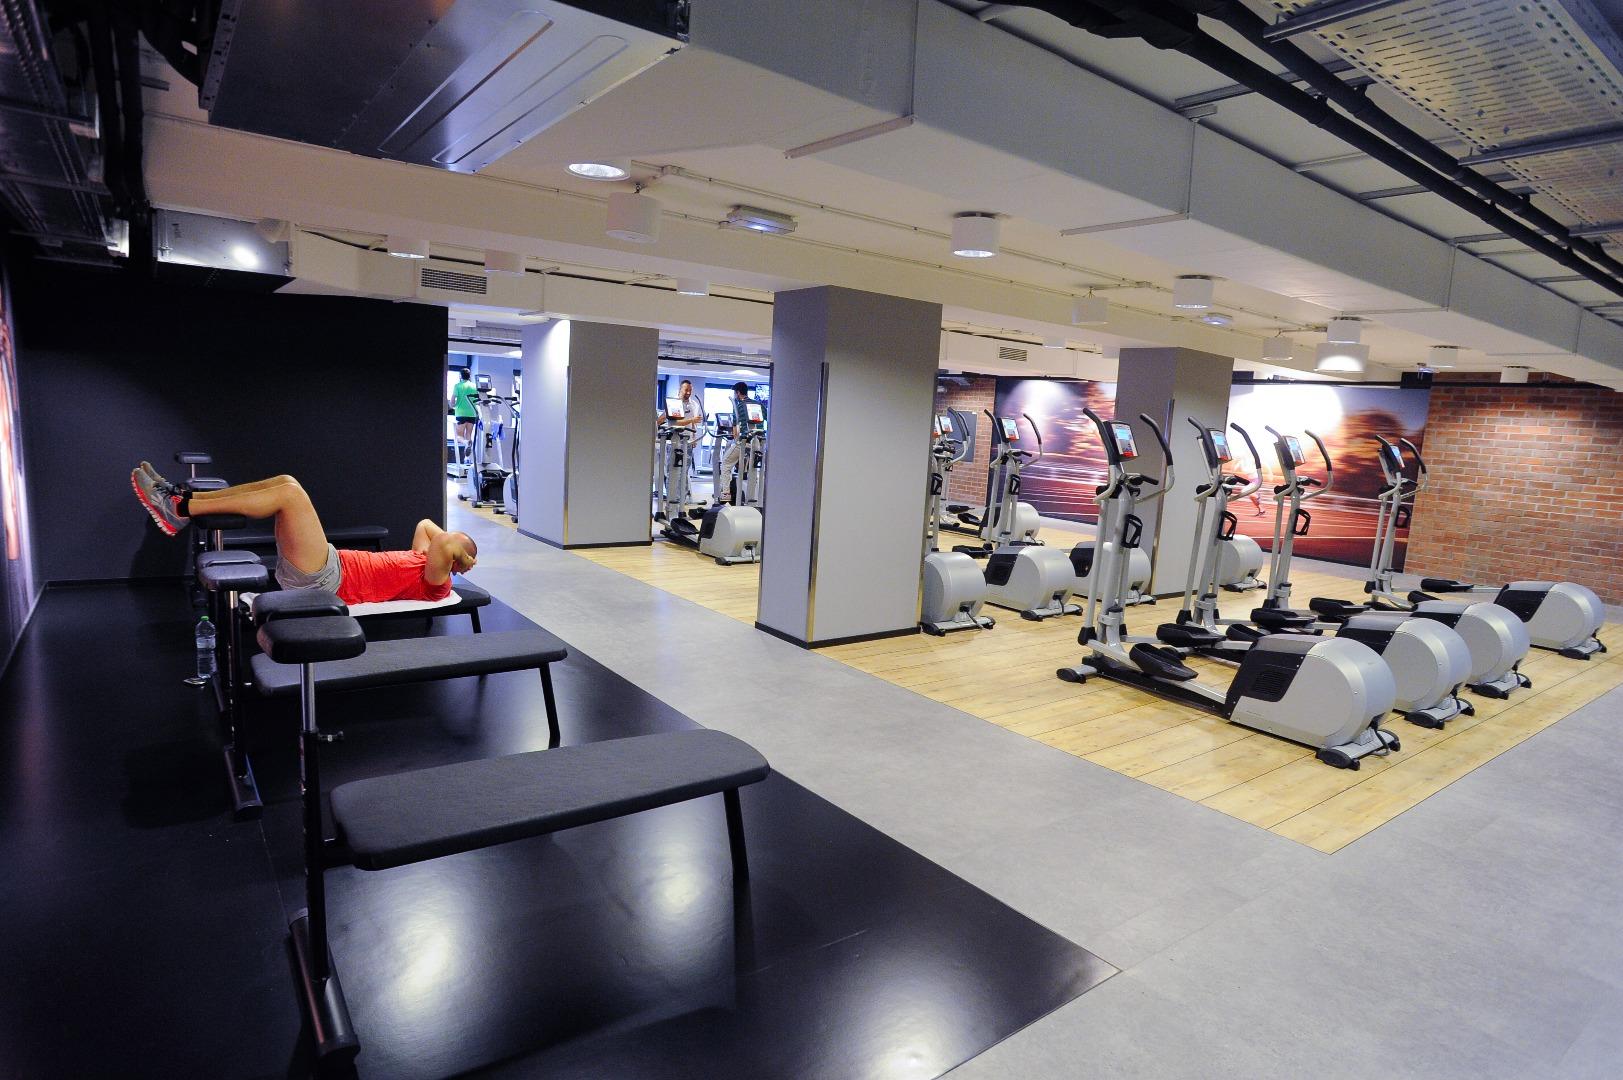 Carrefour gym